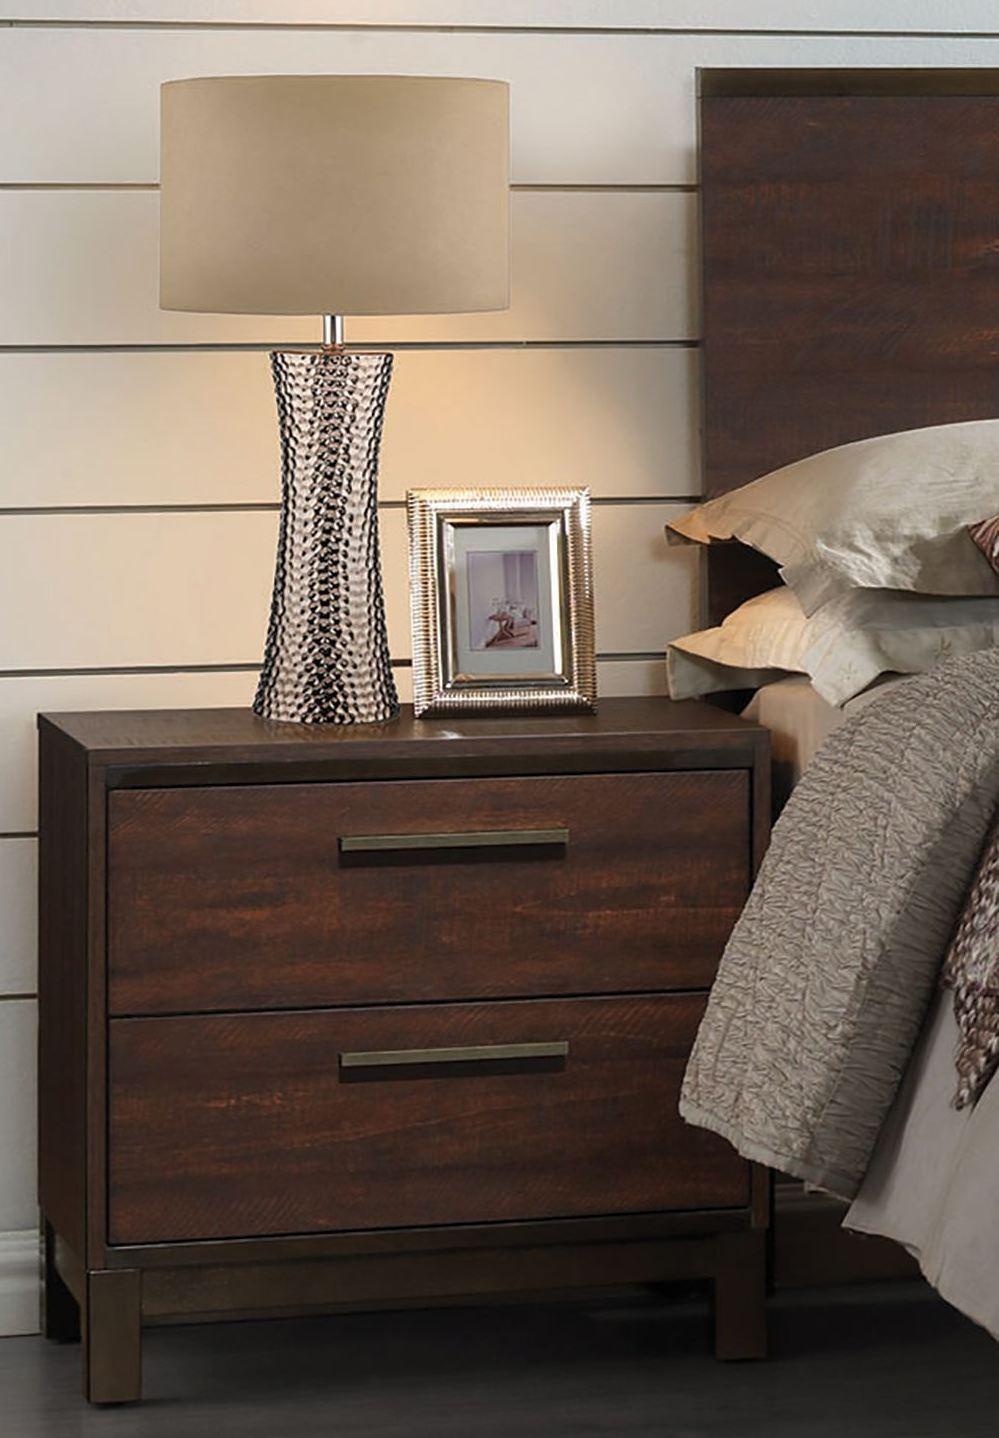 Edmonton rustic tobacco platform bedroom set 204351q for Bedroom furniture edmonton